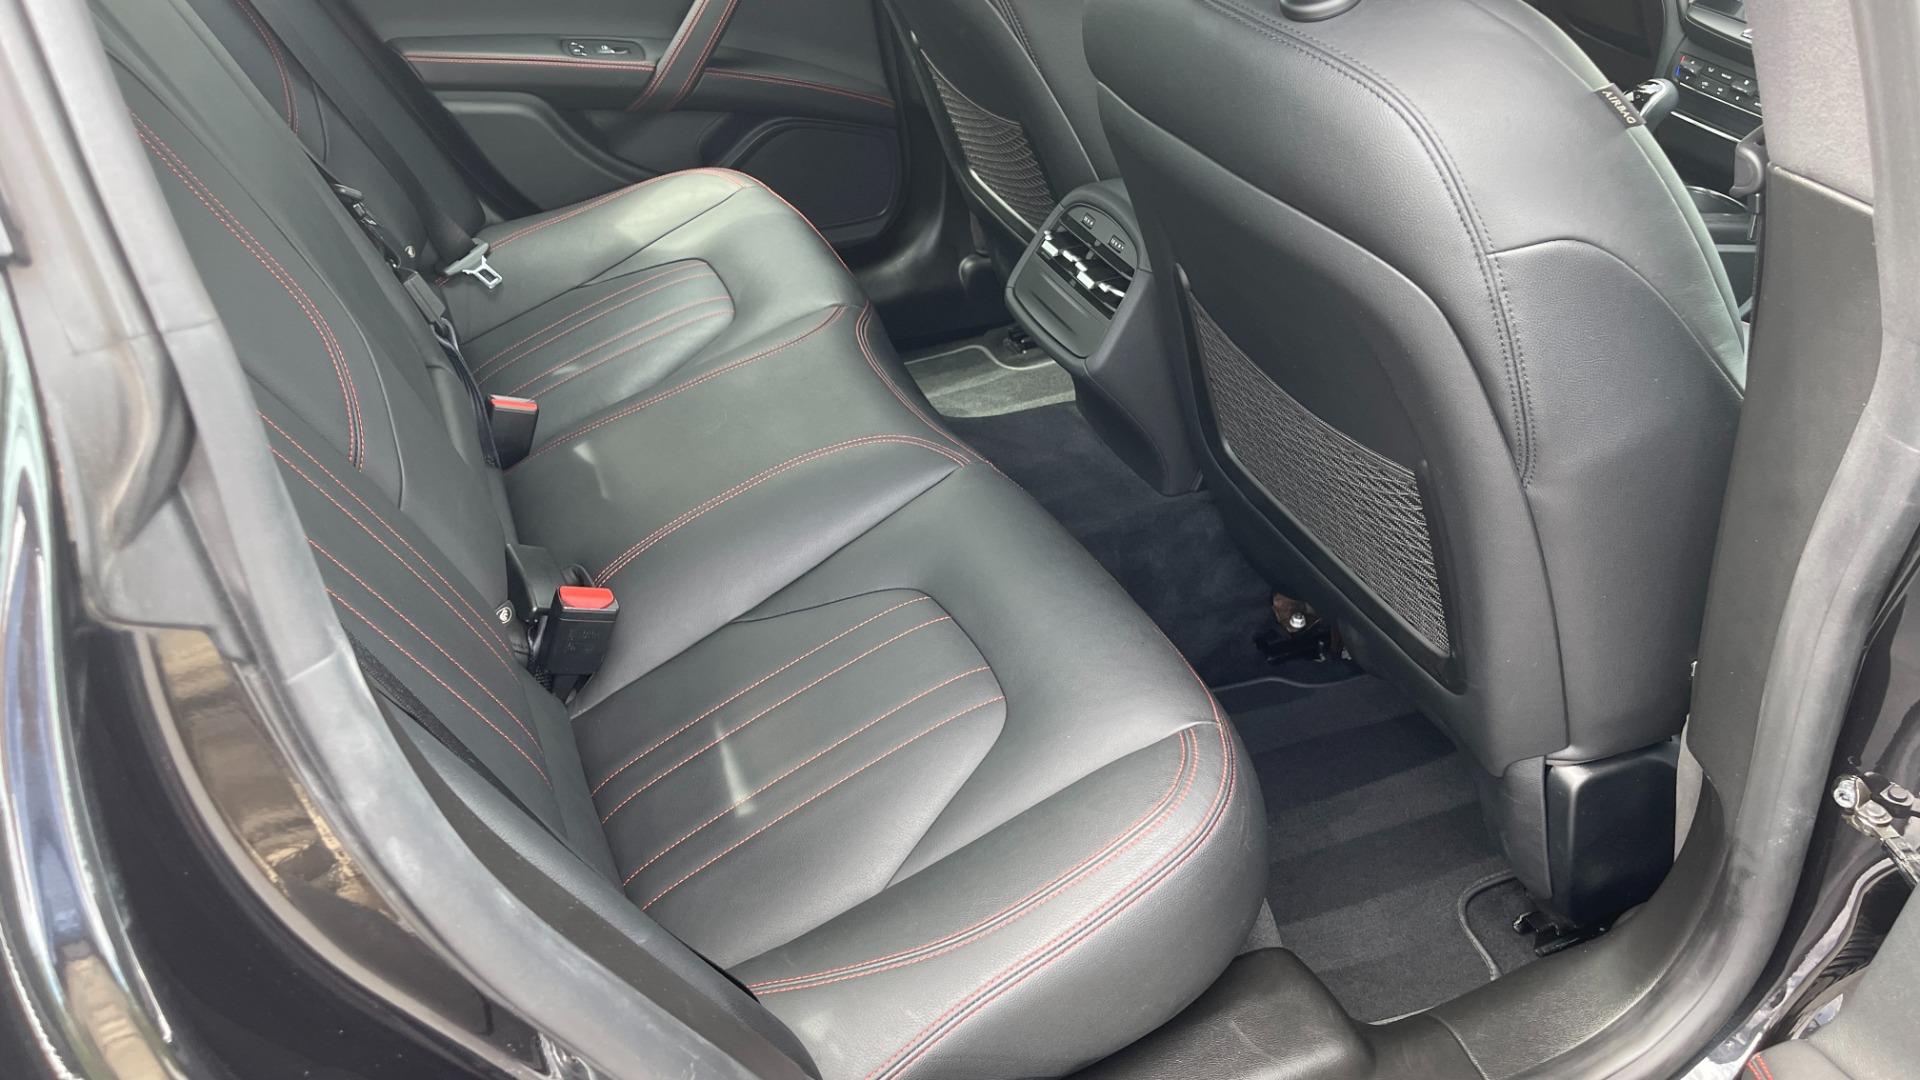 Used 2018 Maserati GHIBLI S Q4 SEDAN / AWD / 3.0L V6 / SUNROOF / NAV / REARVIEW for sale $51,995 at Formula Imports in Charlotte NC 28227 59